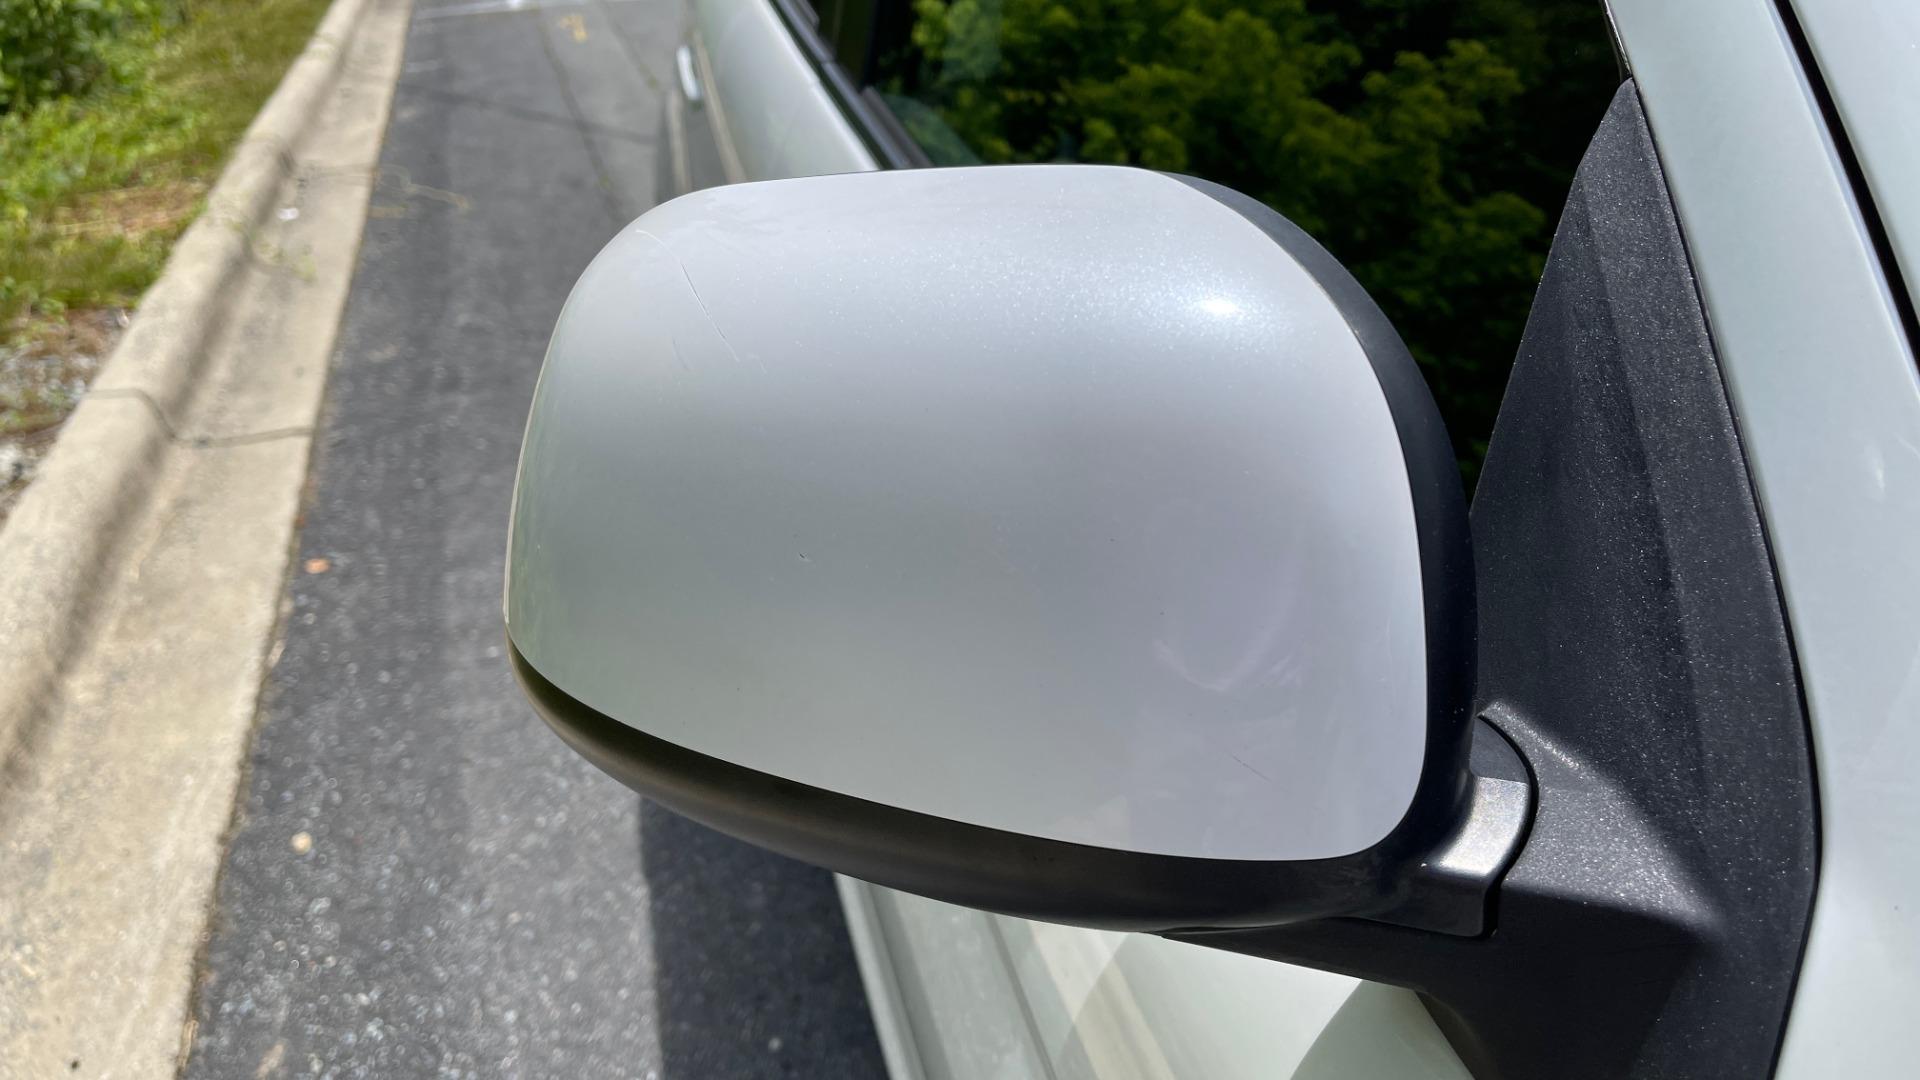 Used 2014 Mitsubishi OUTLANDER SPORT ES 2WD / 2.0L / CVT TRANS / 18IN WHEELS / 31MPG for sale $8,495 at Formula Imports in Charlotte NC 28227 16